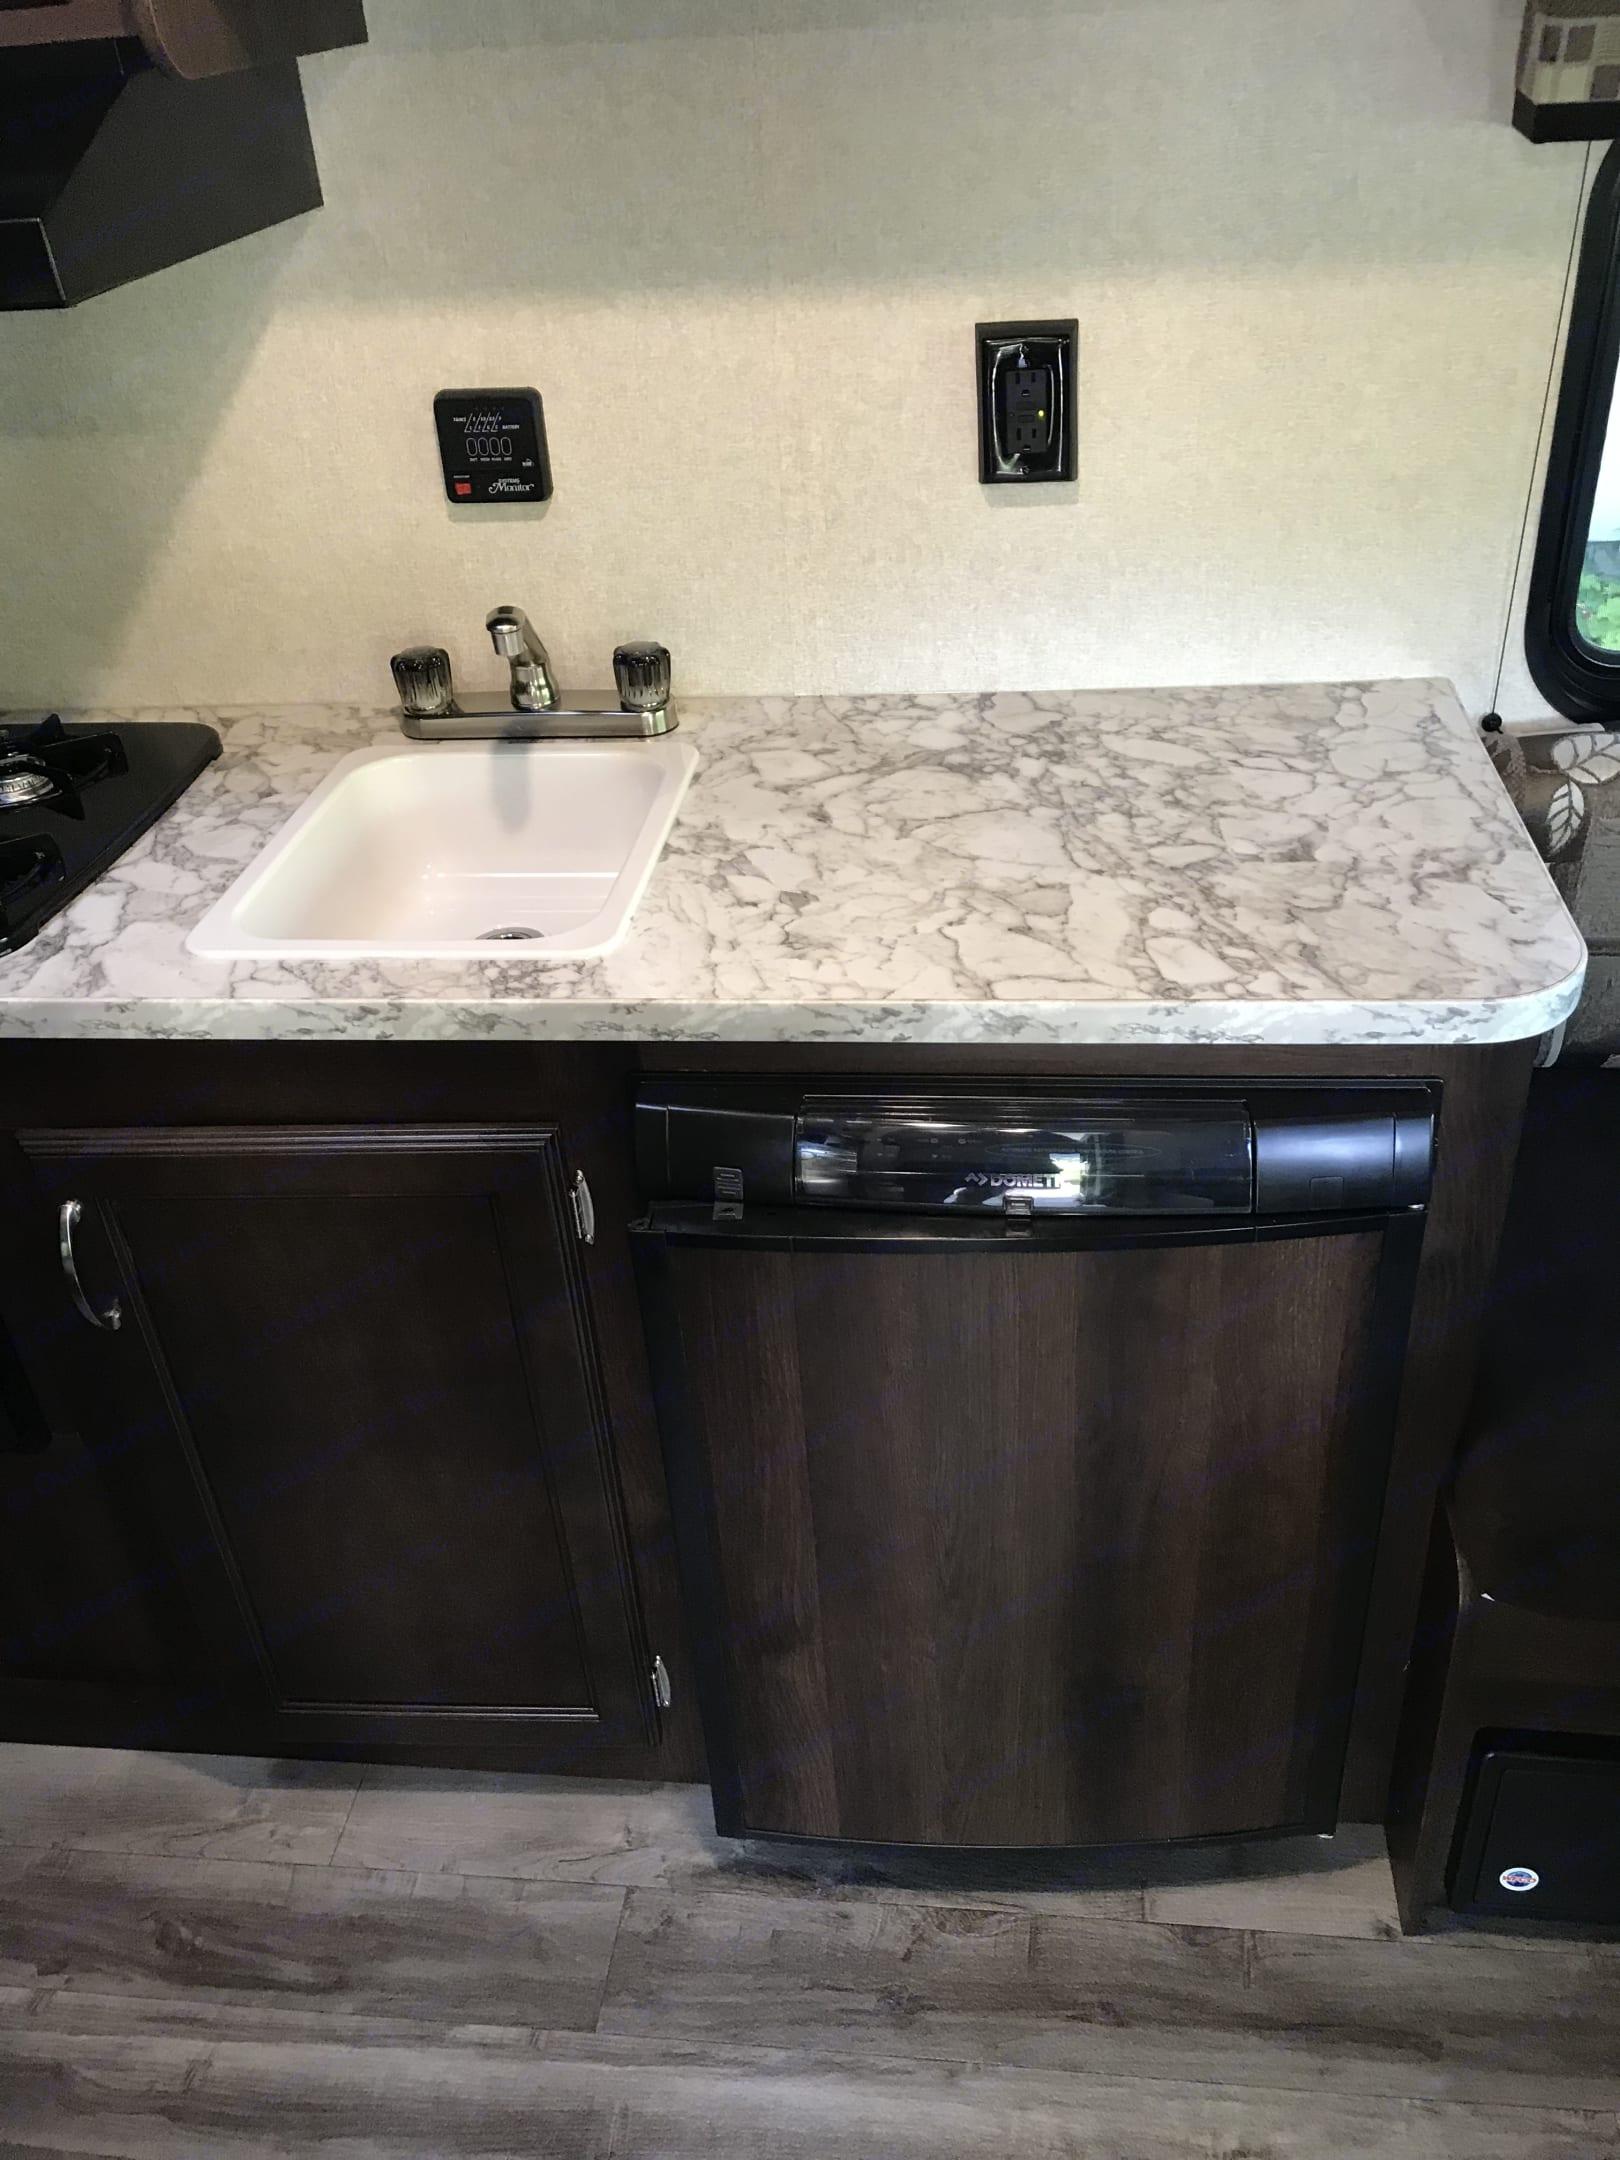 Full kitchen counter and top of fridge! . Jayco Jay Flight 2018